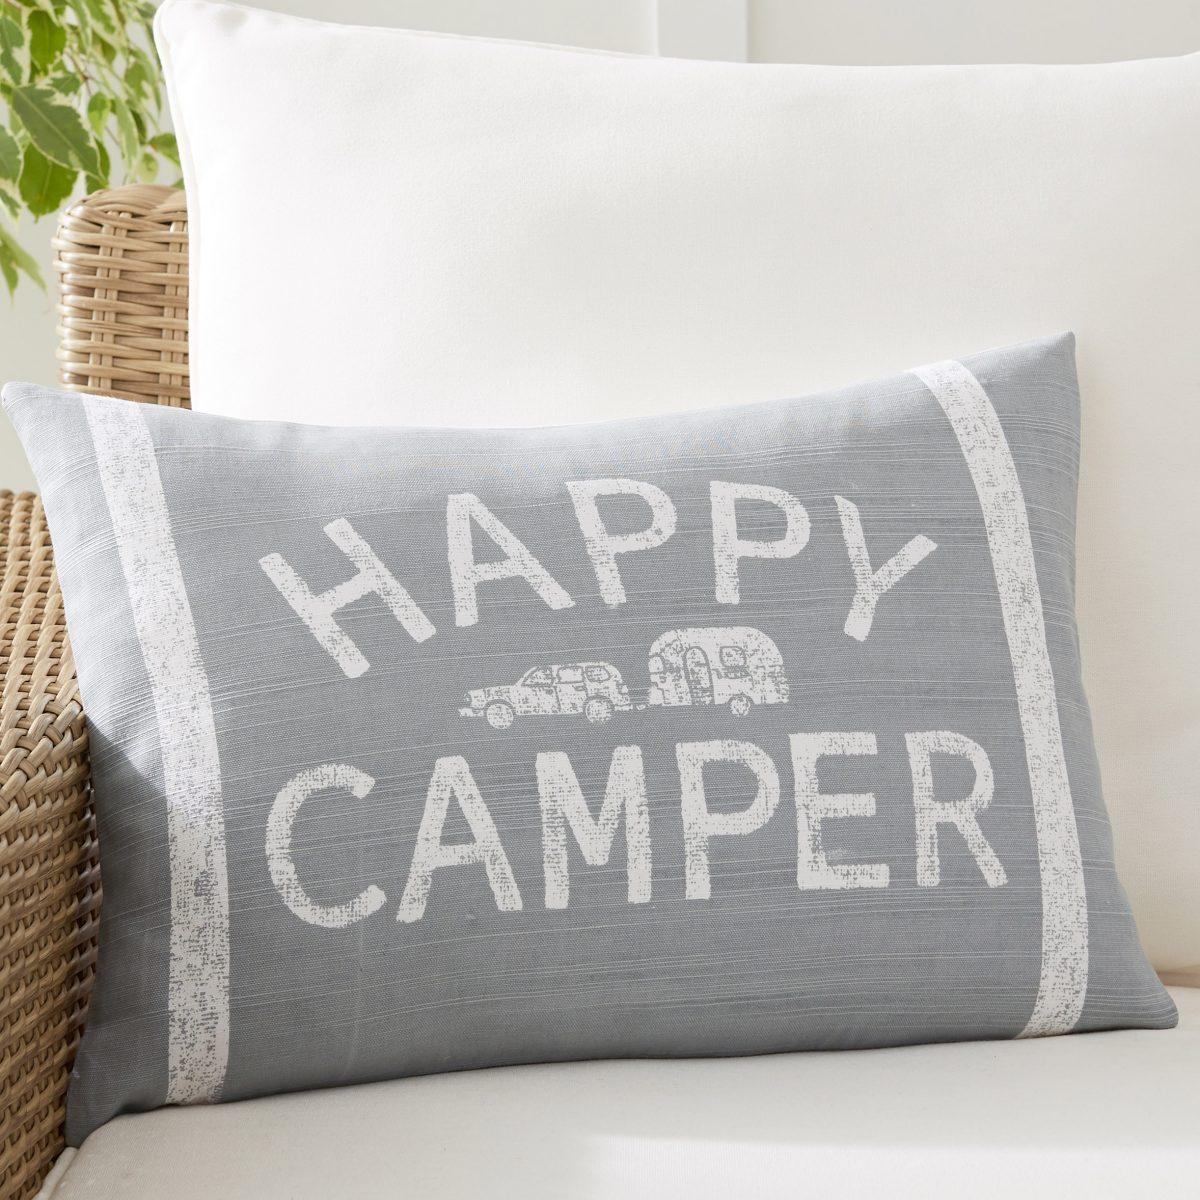 Airstream + Pottery Barn Happy Camper Lumbar Pillow